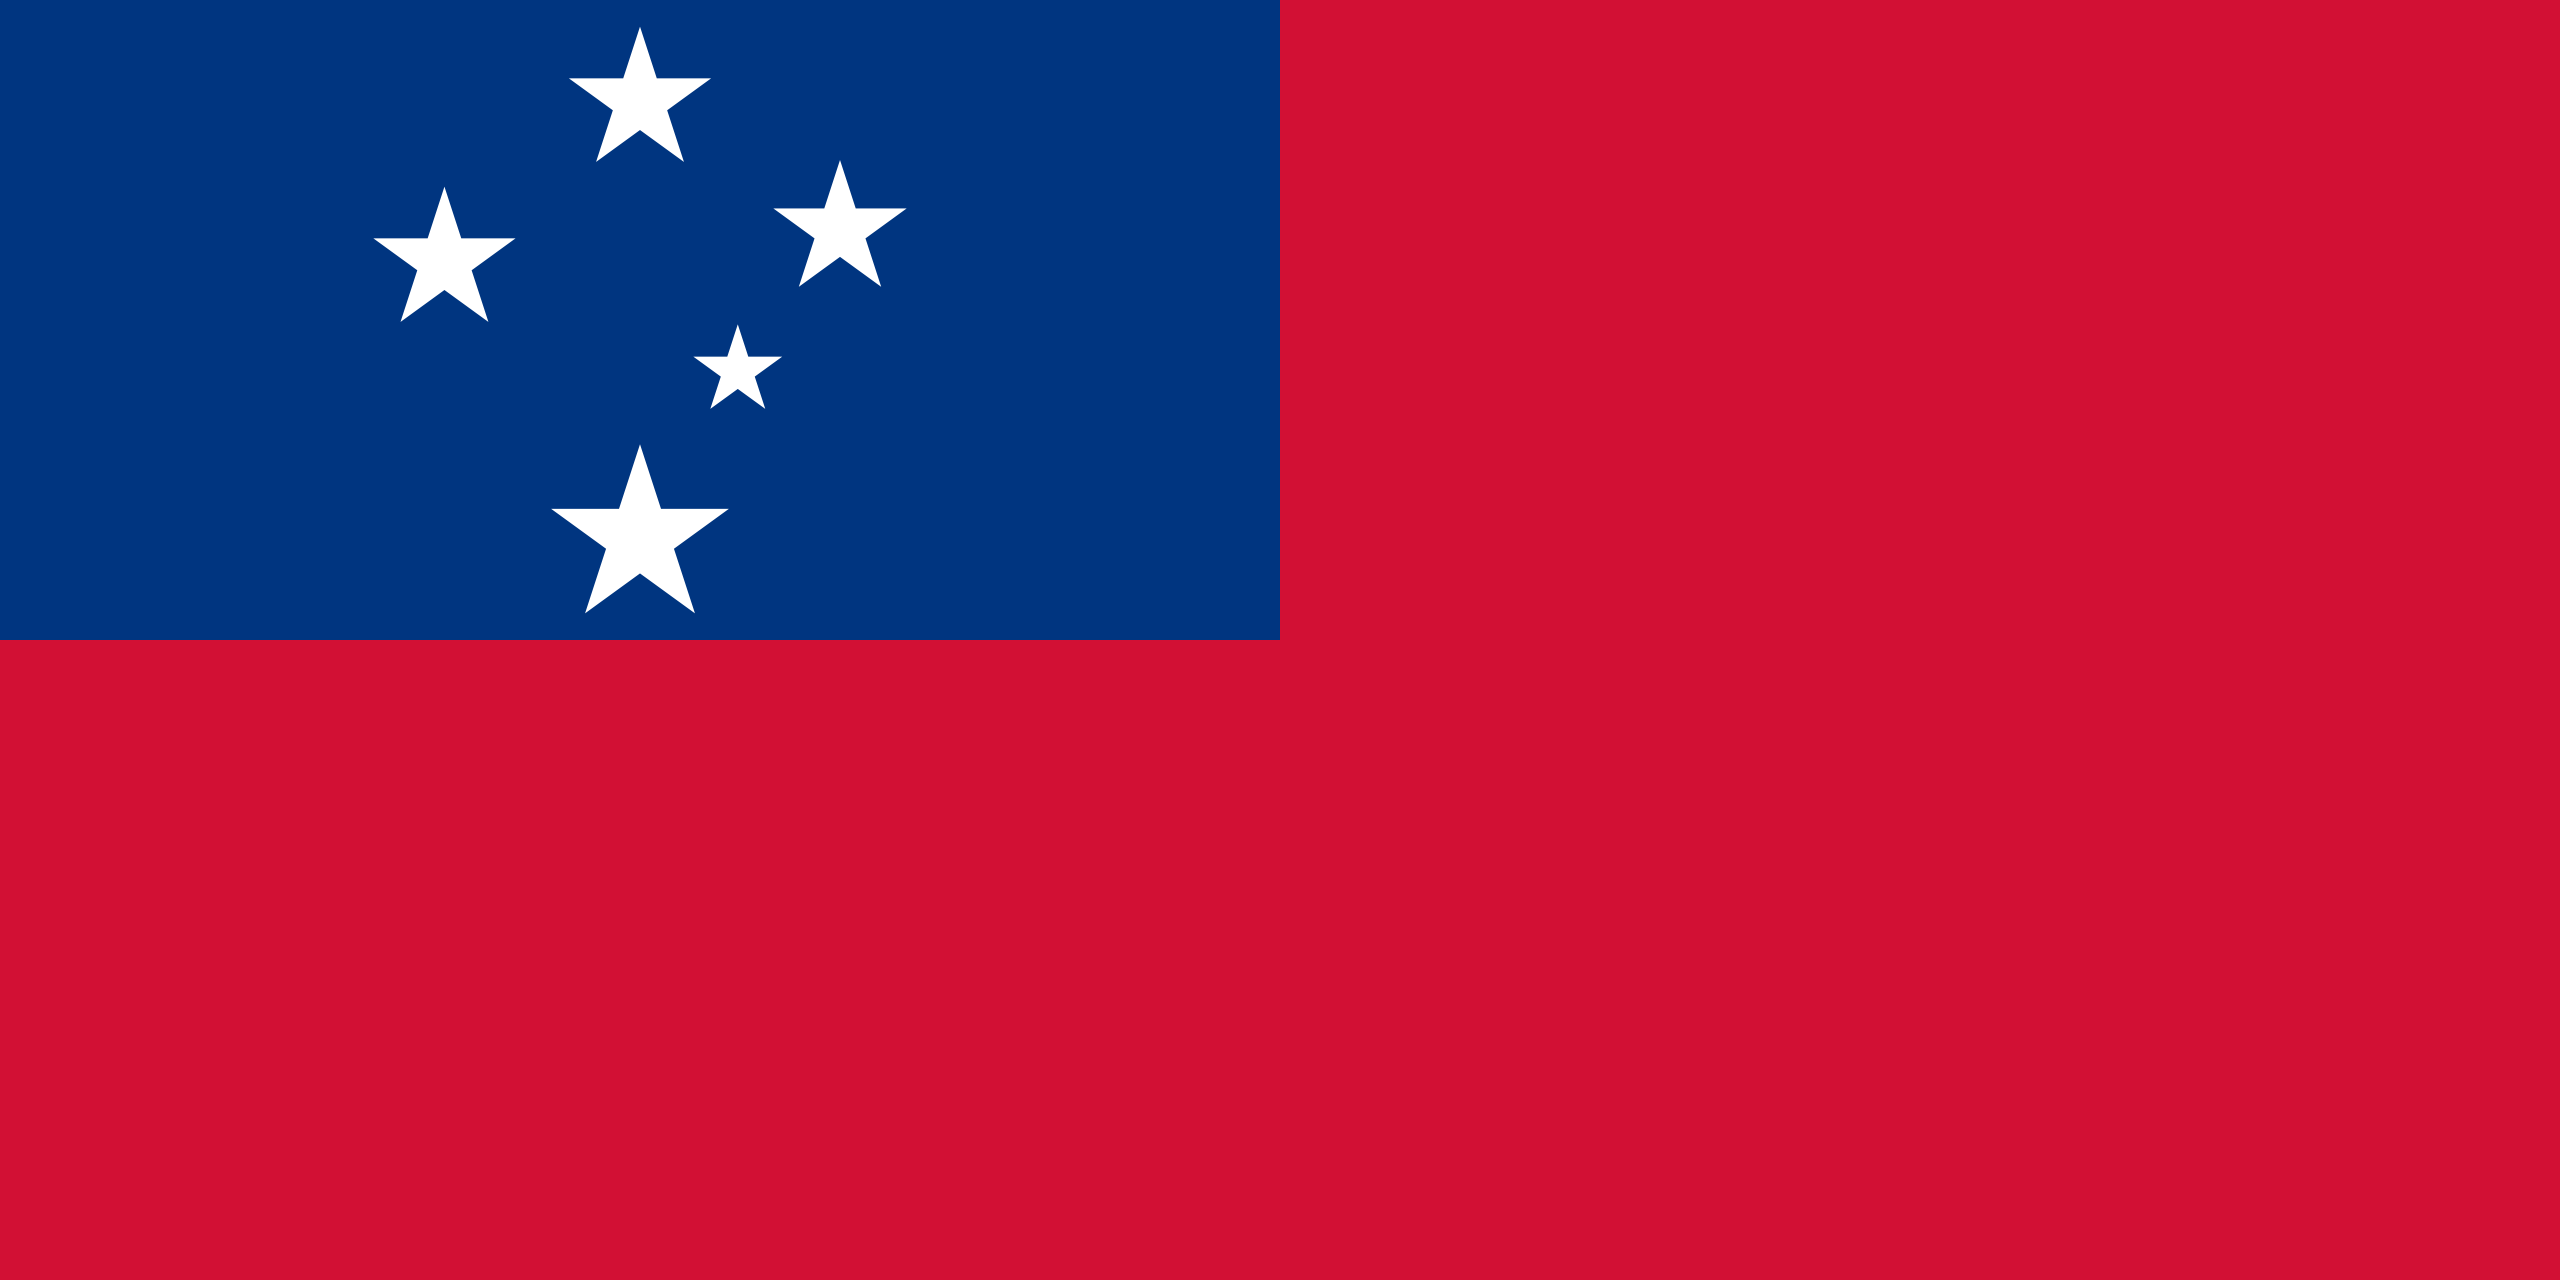 samoa, país, emblema, insignia, символ - Обои HD - Профессор falken.com